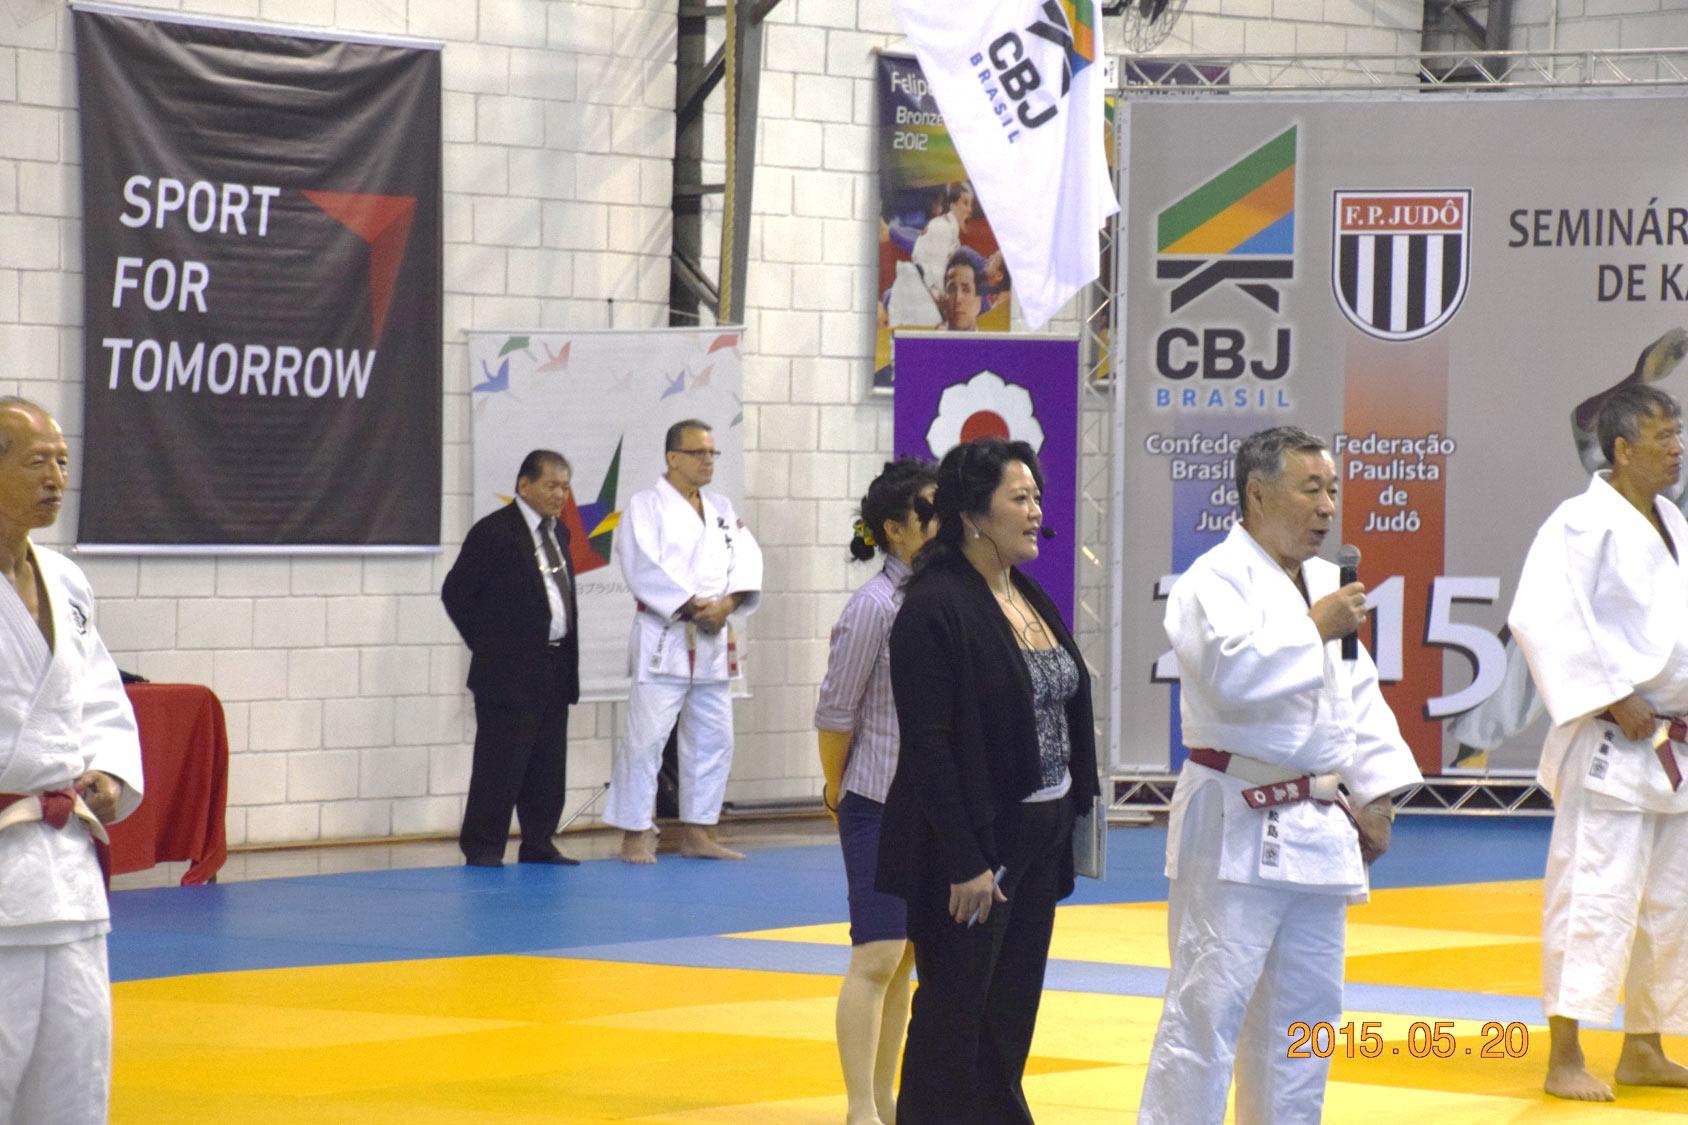 【Brazil】Cultural Project of the Diplomatic Mission, <br /></ br>Kodokan Judo, Lecture Demonstration Workshop4